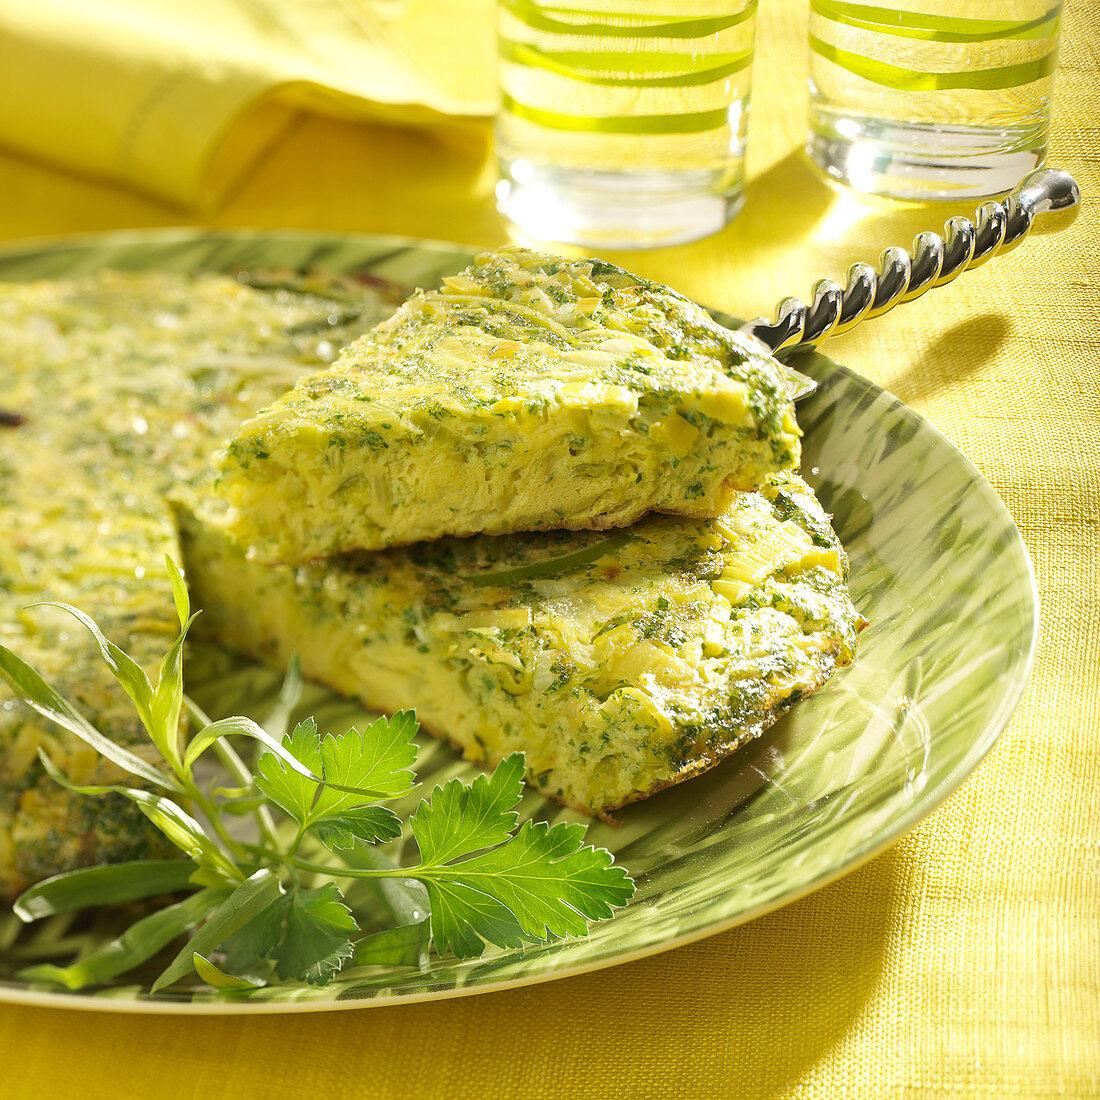 Leek and herb savoury cake